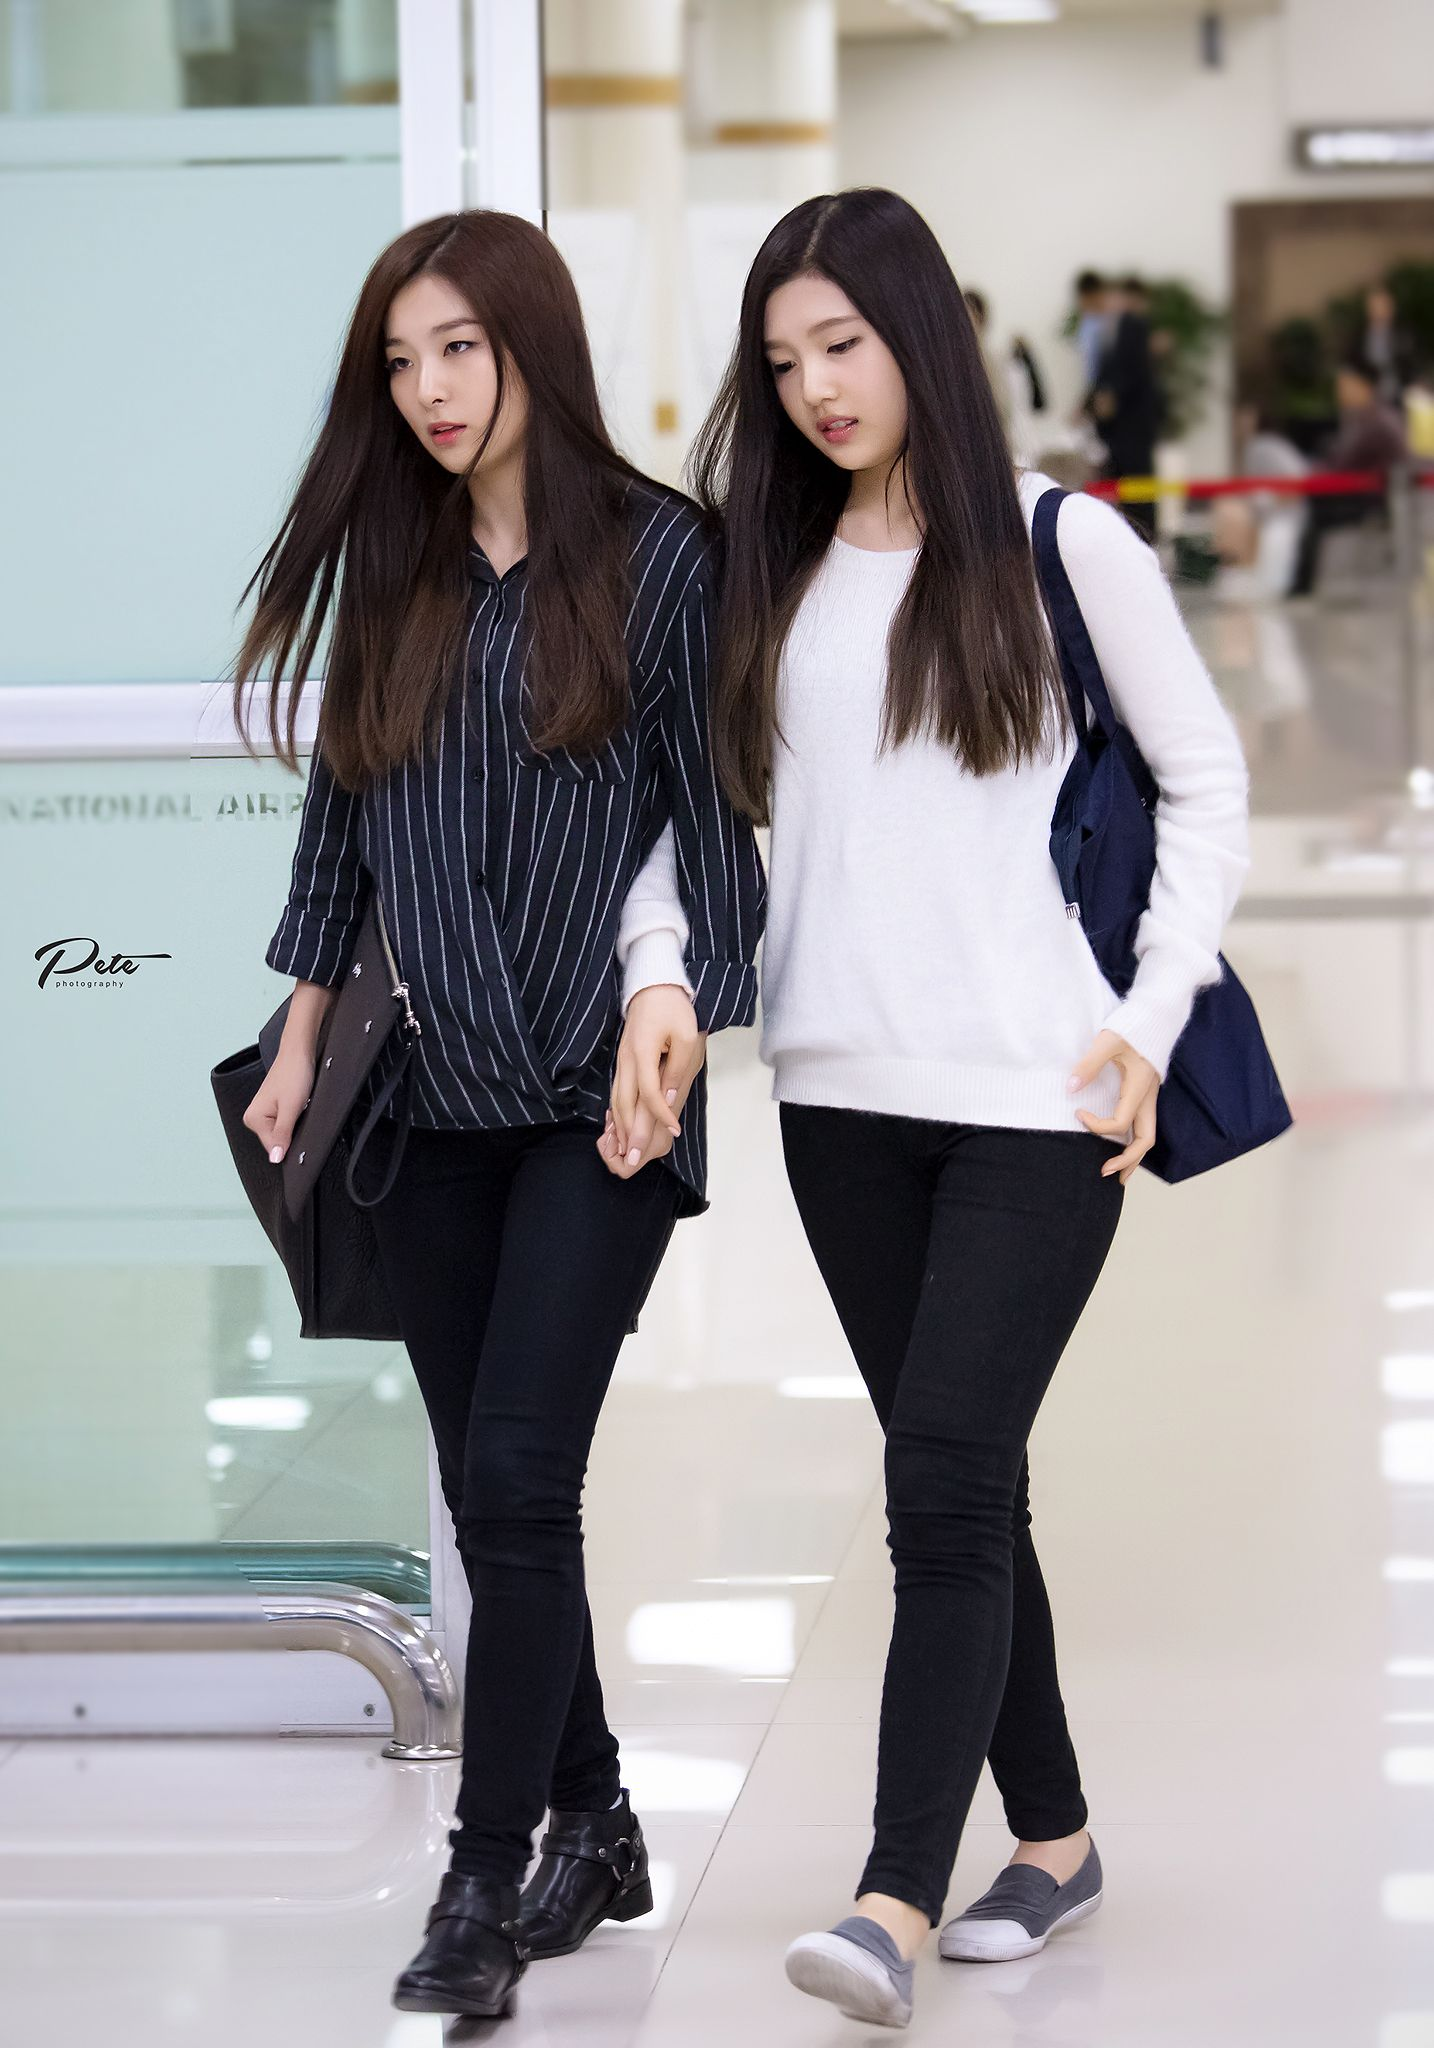 Red Velvet Seulgi Joy Airport Fashion 141006 2014 Kpop Pakaian Bandara Pakaian Selebritas